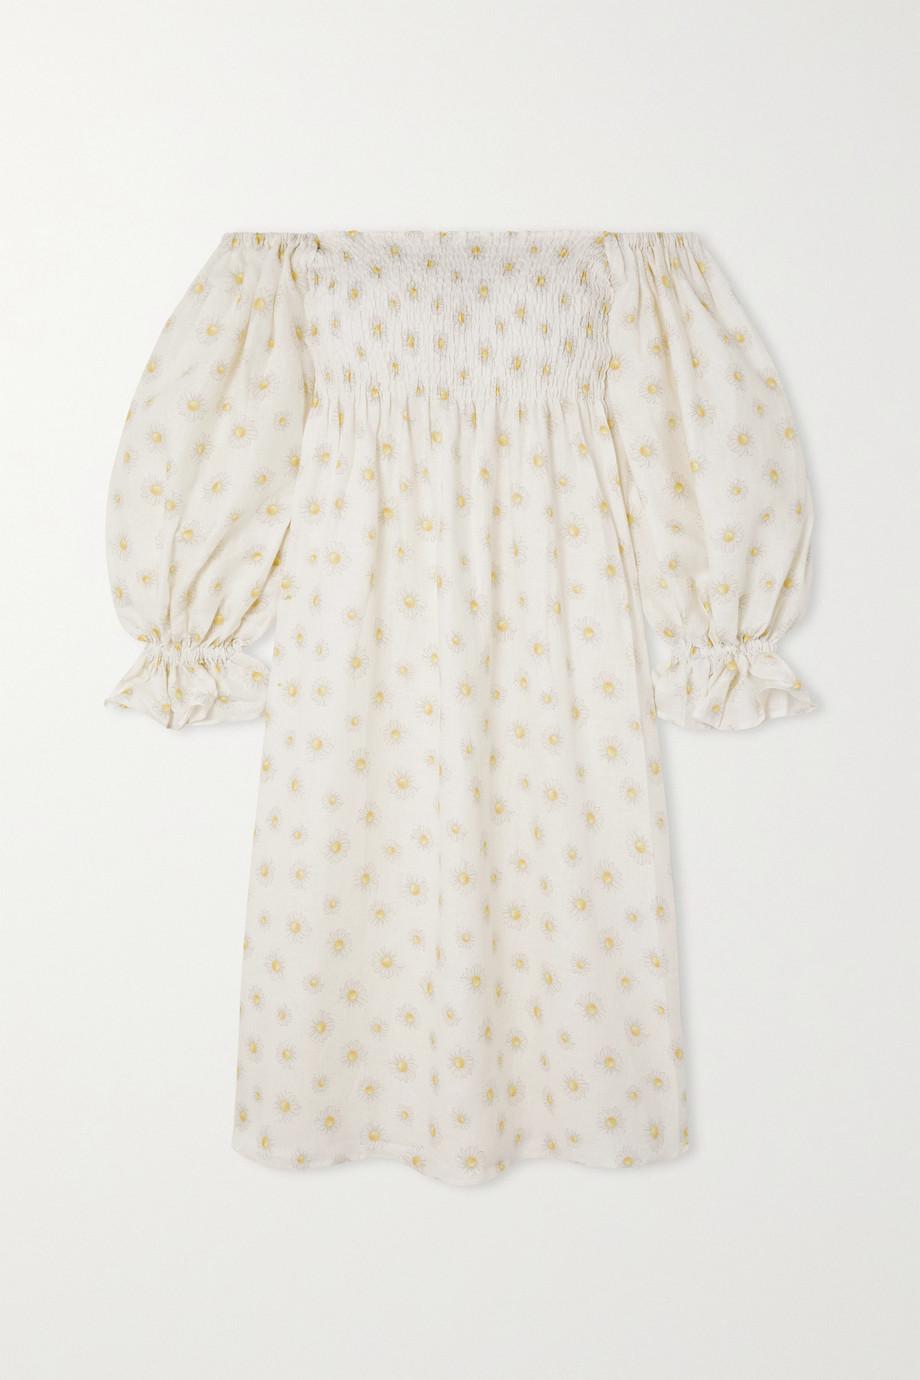 Sleeper Robe midi épaules nues en lin à imprimé fleuri et à smocks Atlanta